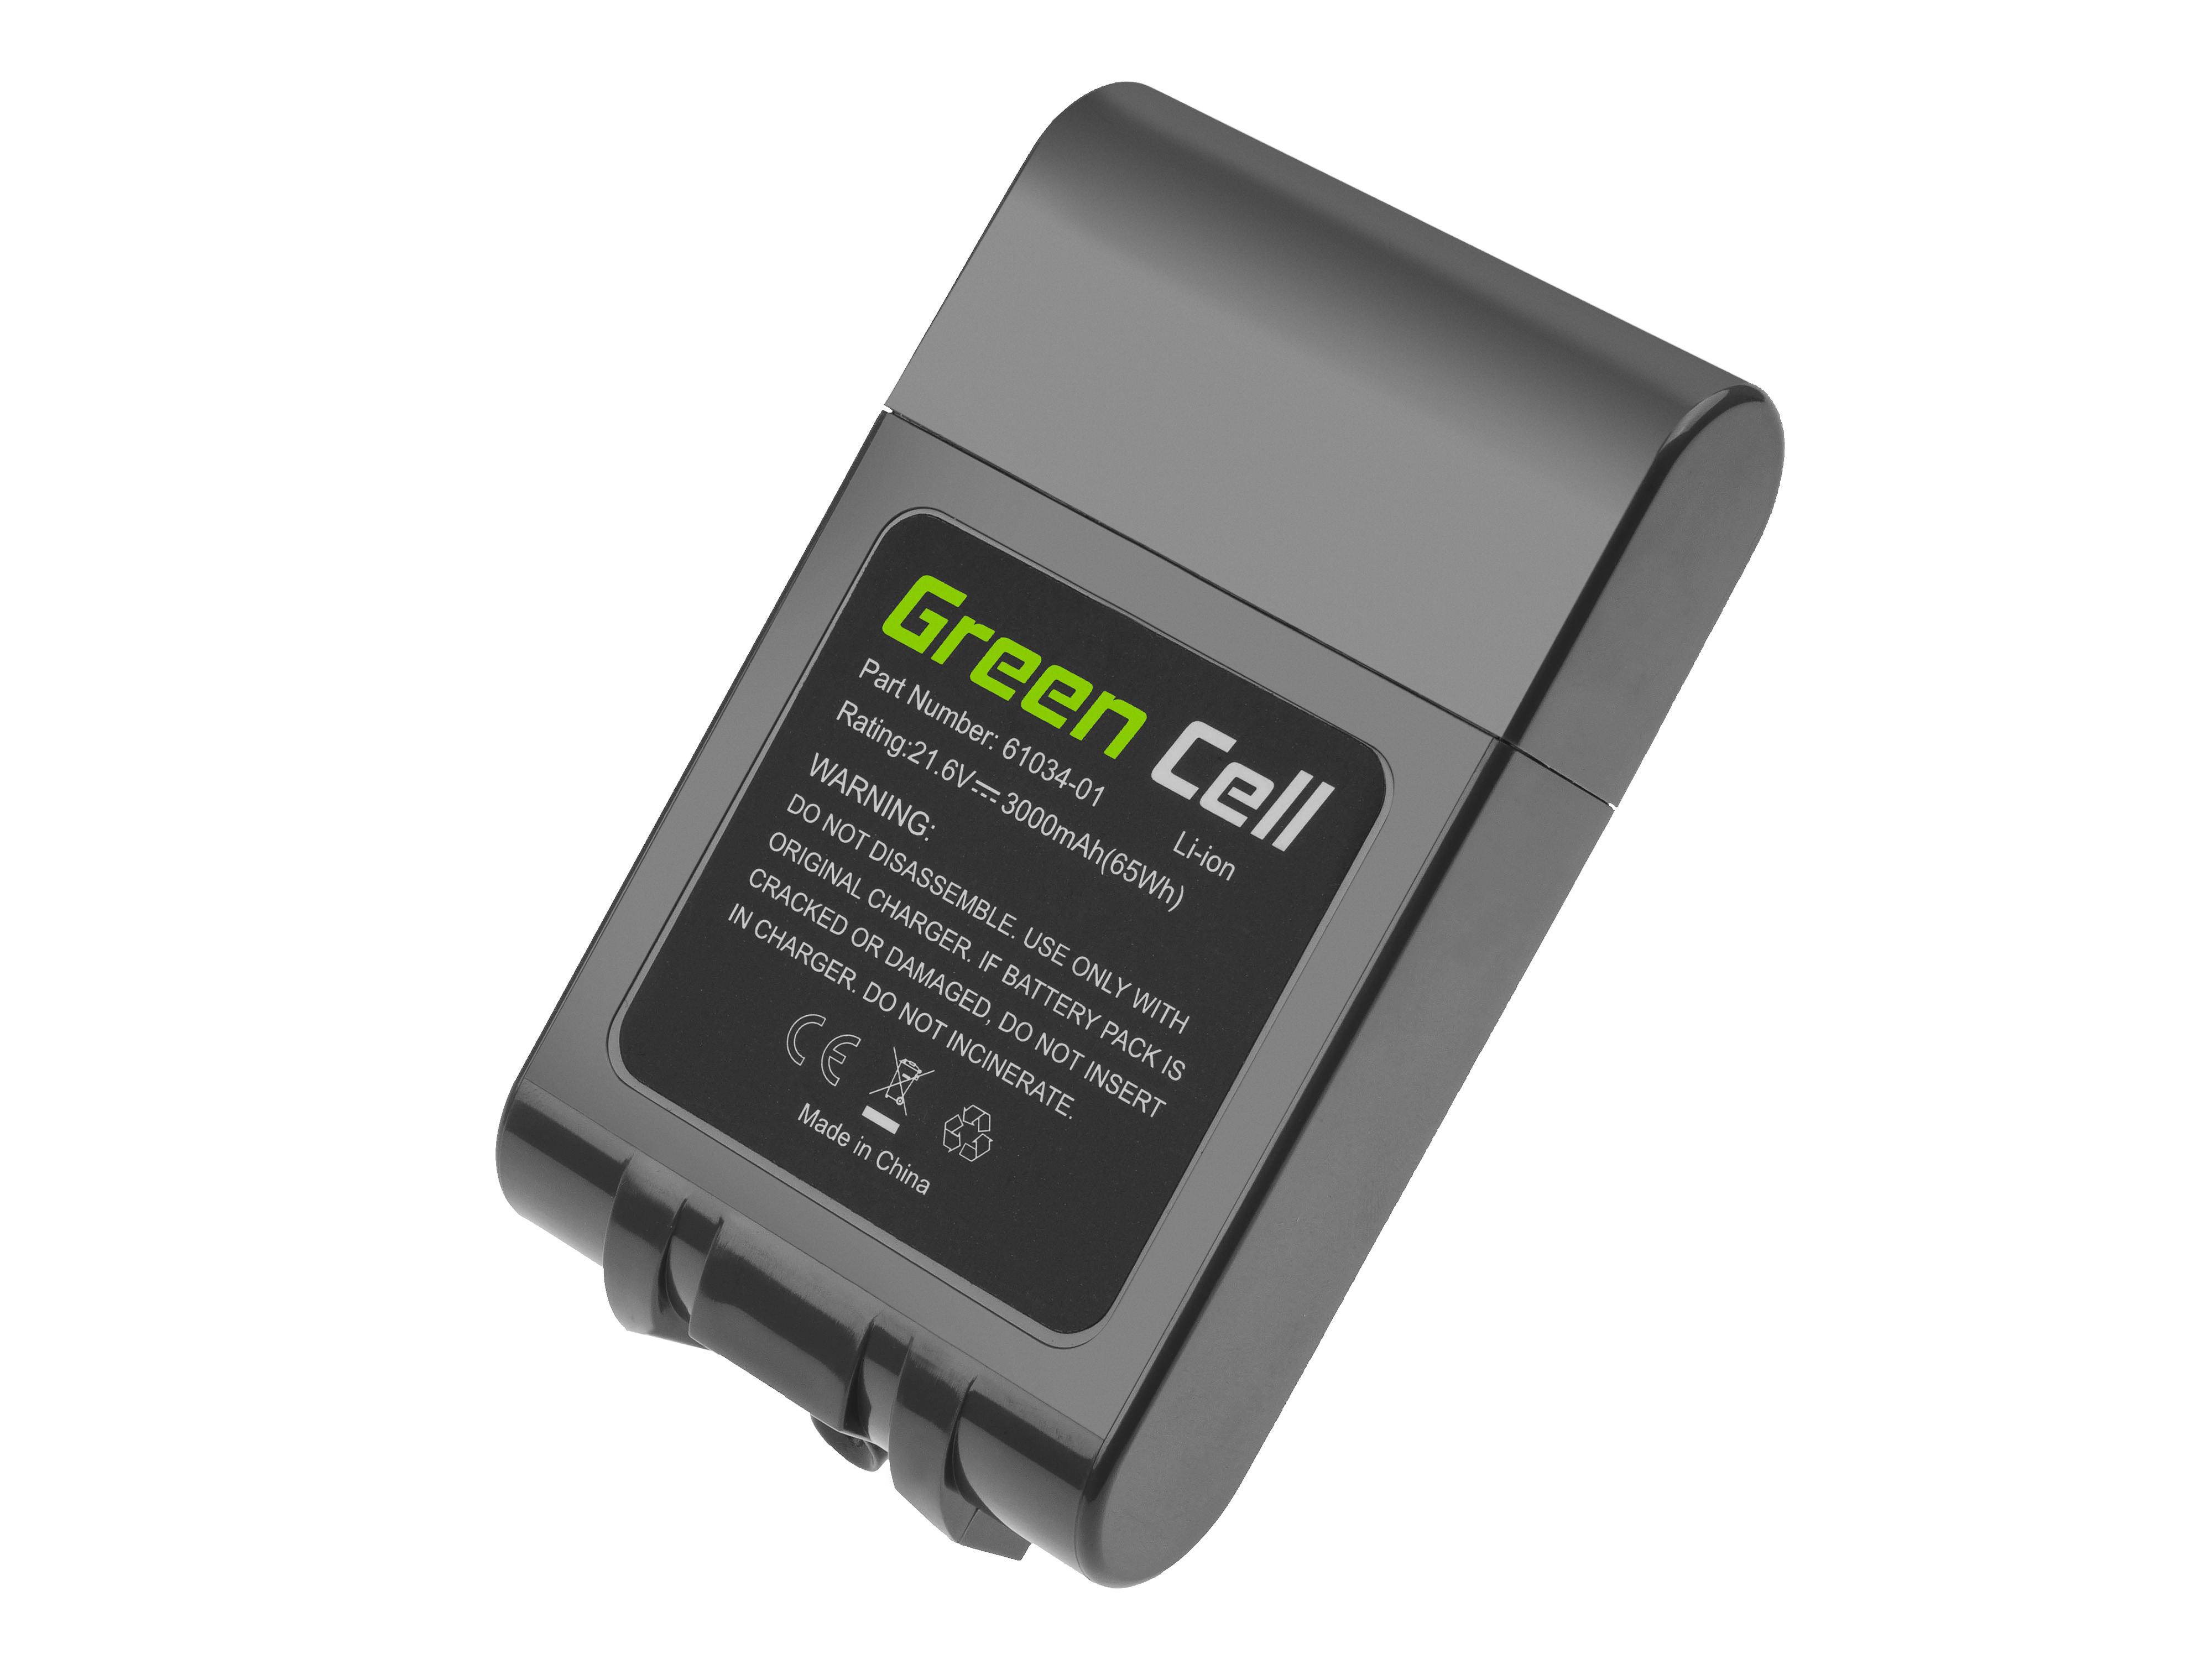 Green Cell PT227 Baterie Dyson 967810-02 209432-01 209472-01, Dyson V6 DC58 DC59 DC61 DC62 DC72 DC74 3000mAh Li-ion - neoriginální